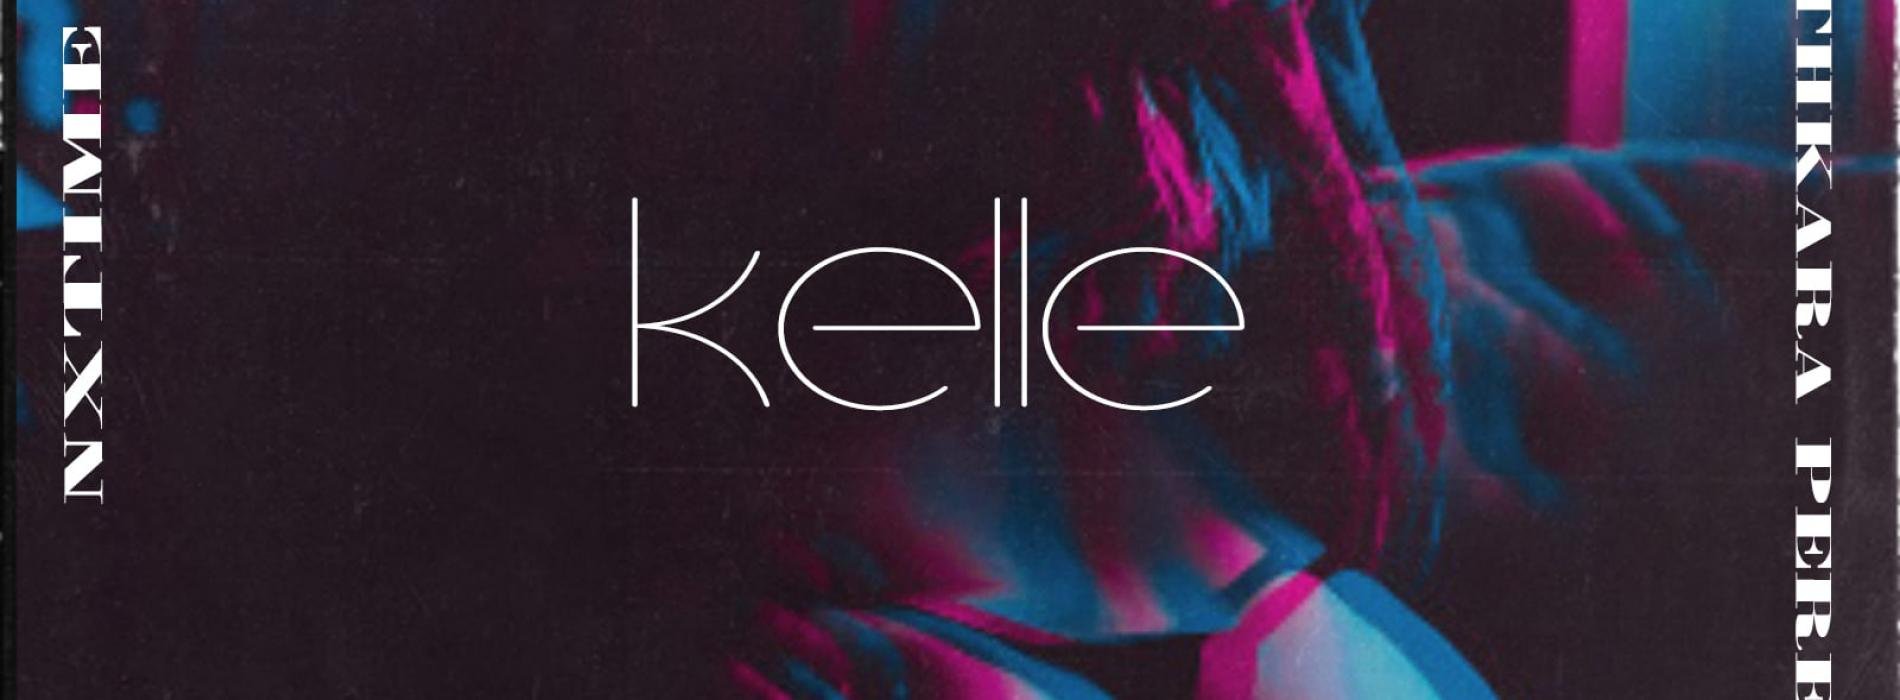 New Music : NxTime feat. Chamathkara Perera – Kelle (Prod by Kevin Maleesha)